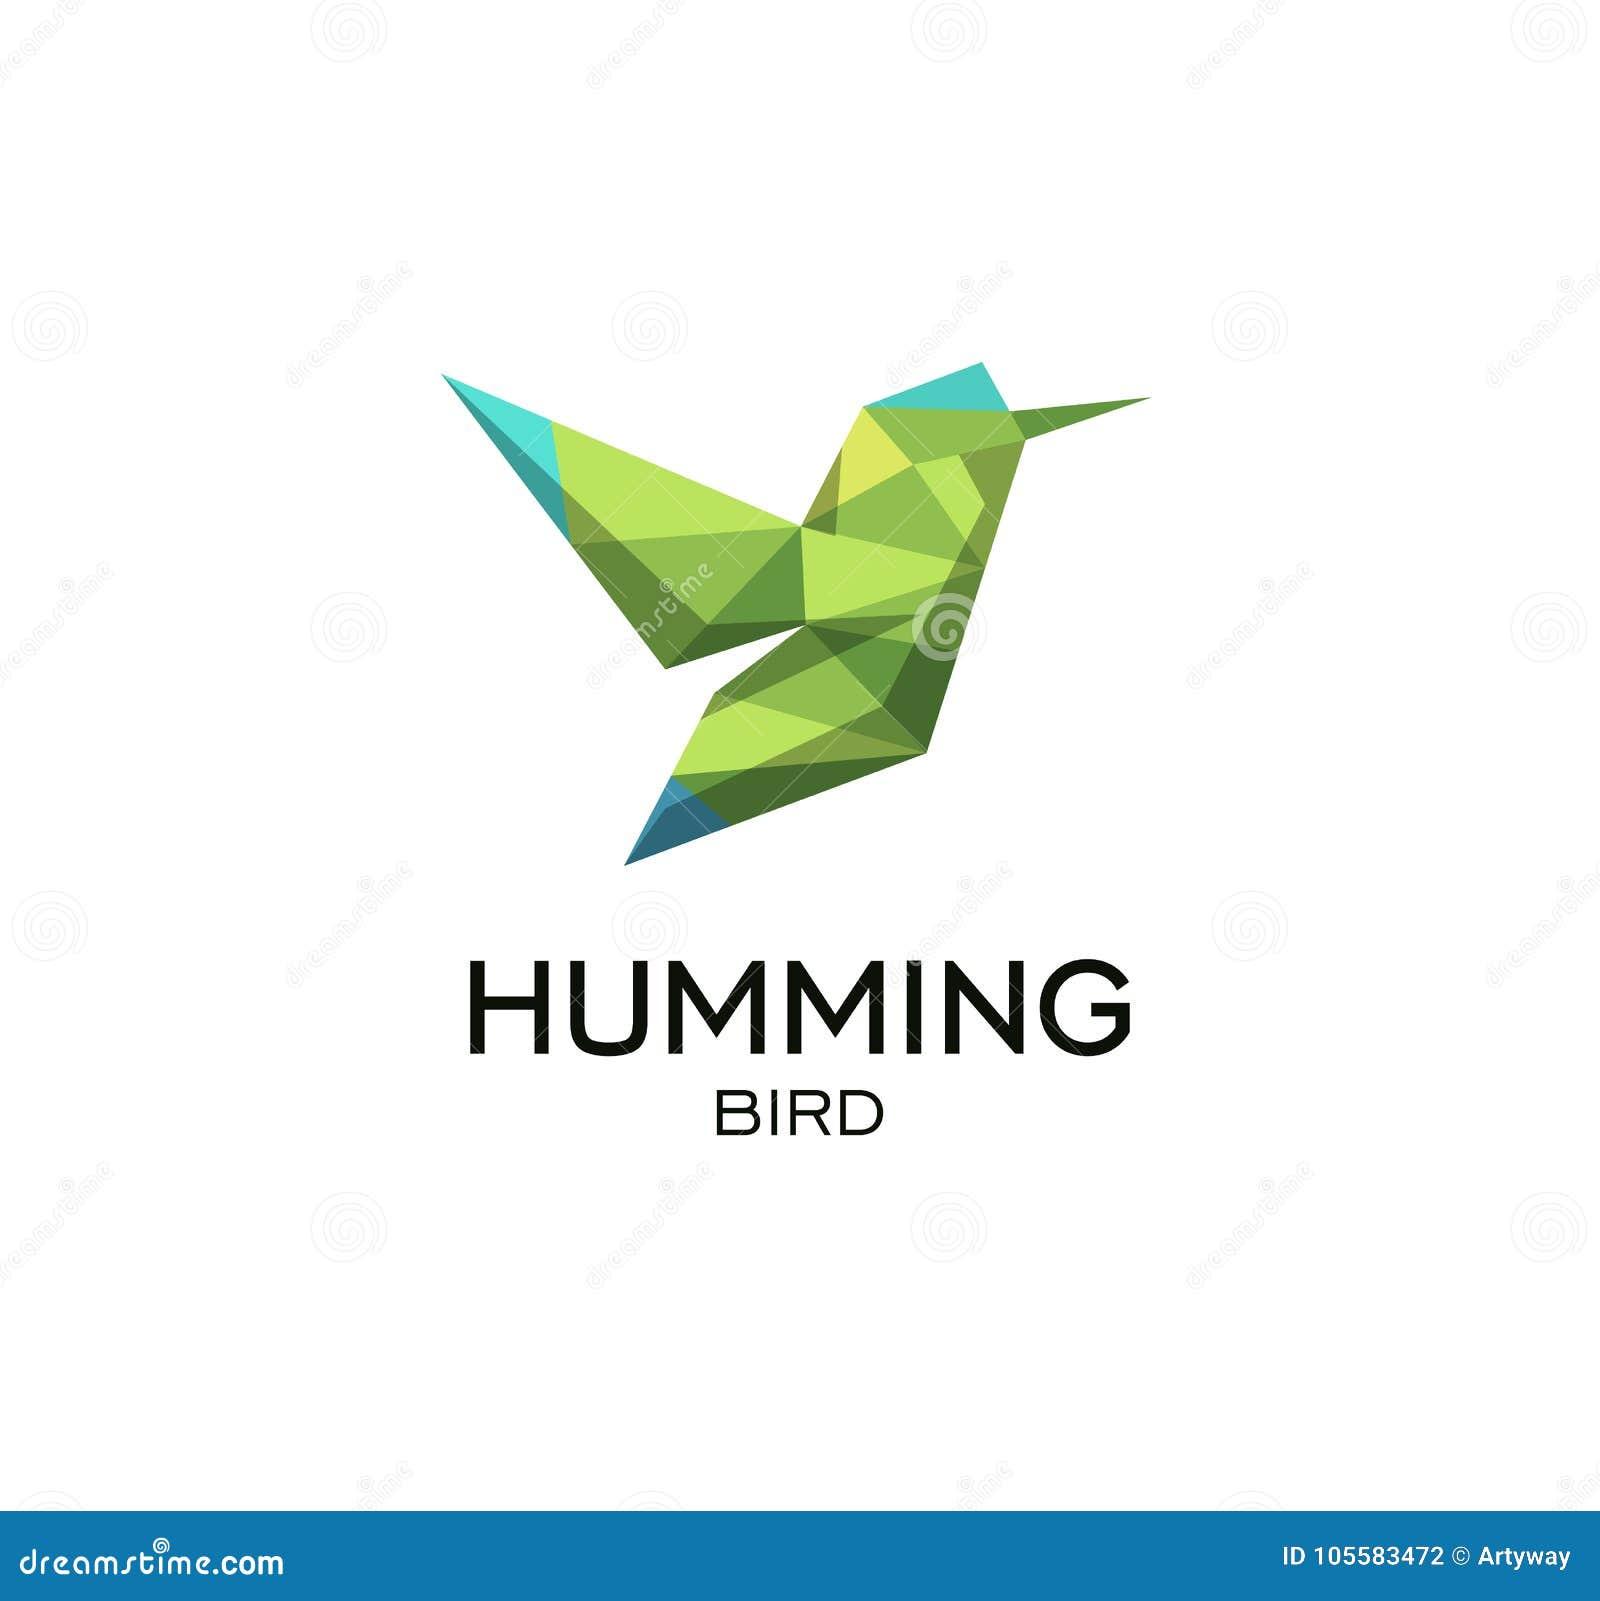 Hummig bird geometrical sign, calibri abstract polygonal vector logo template. Origami green color low poly wild animal